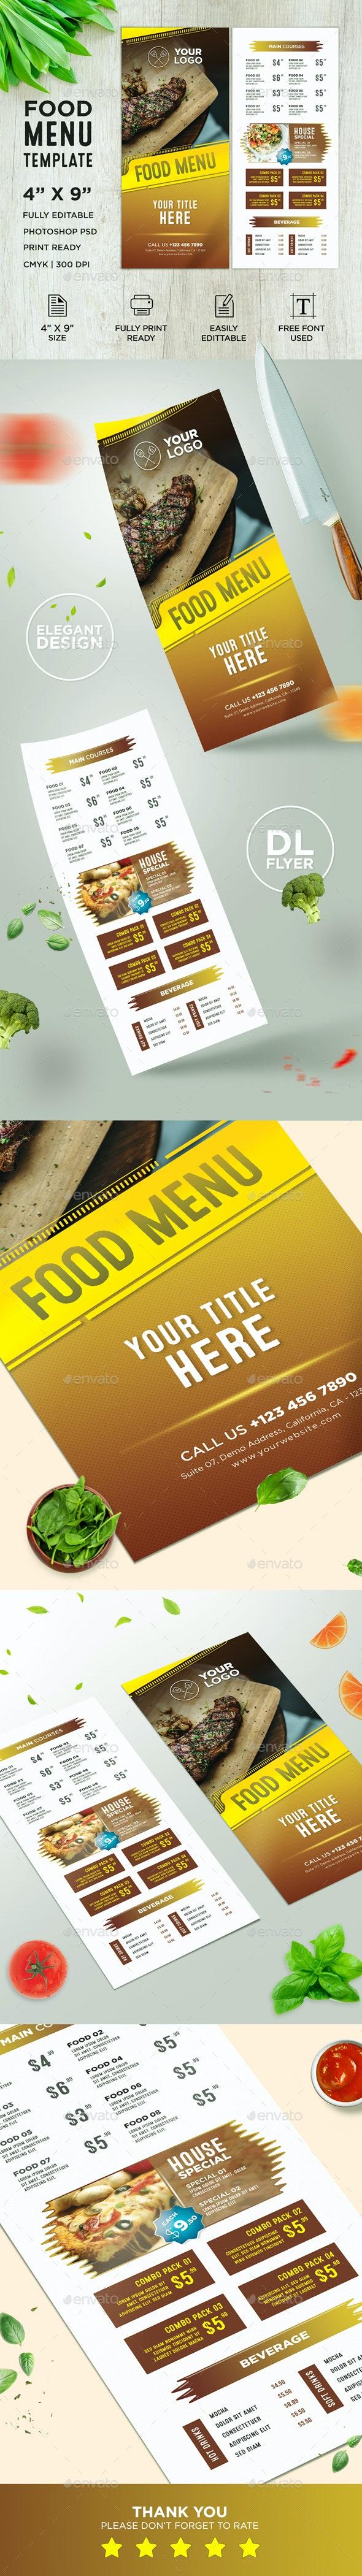 Restaurant DL Flyer - Restaurant Flyers